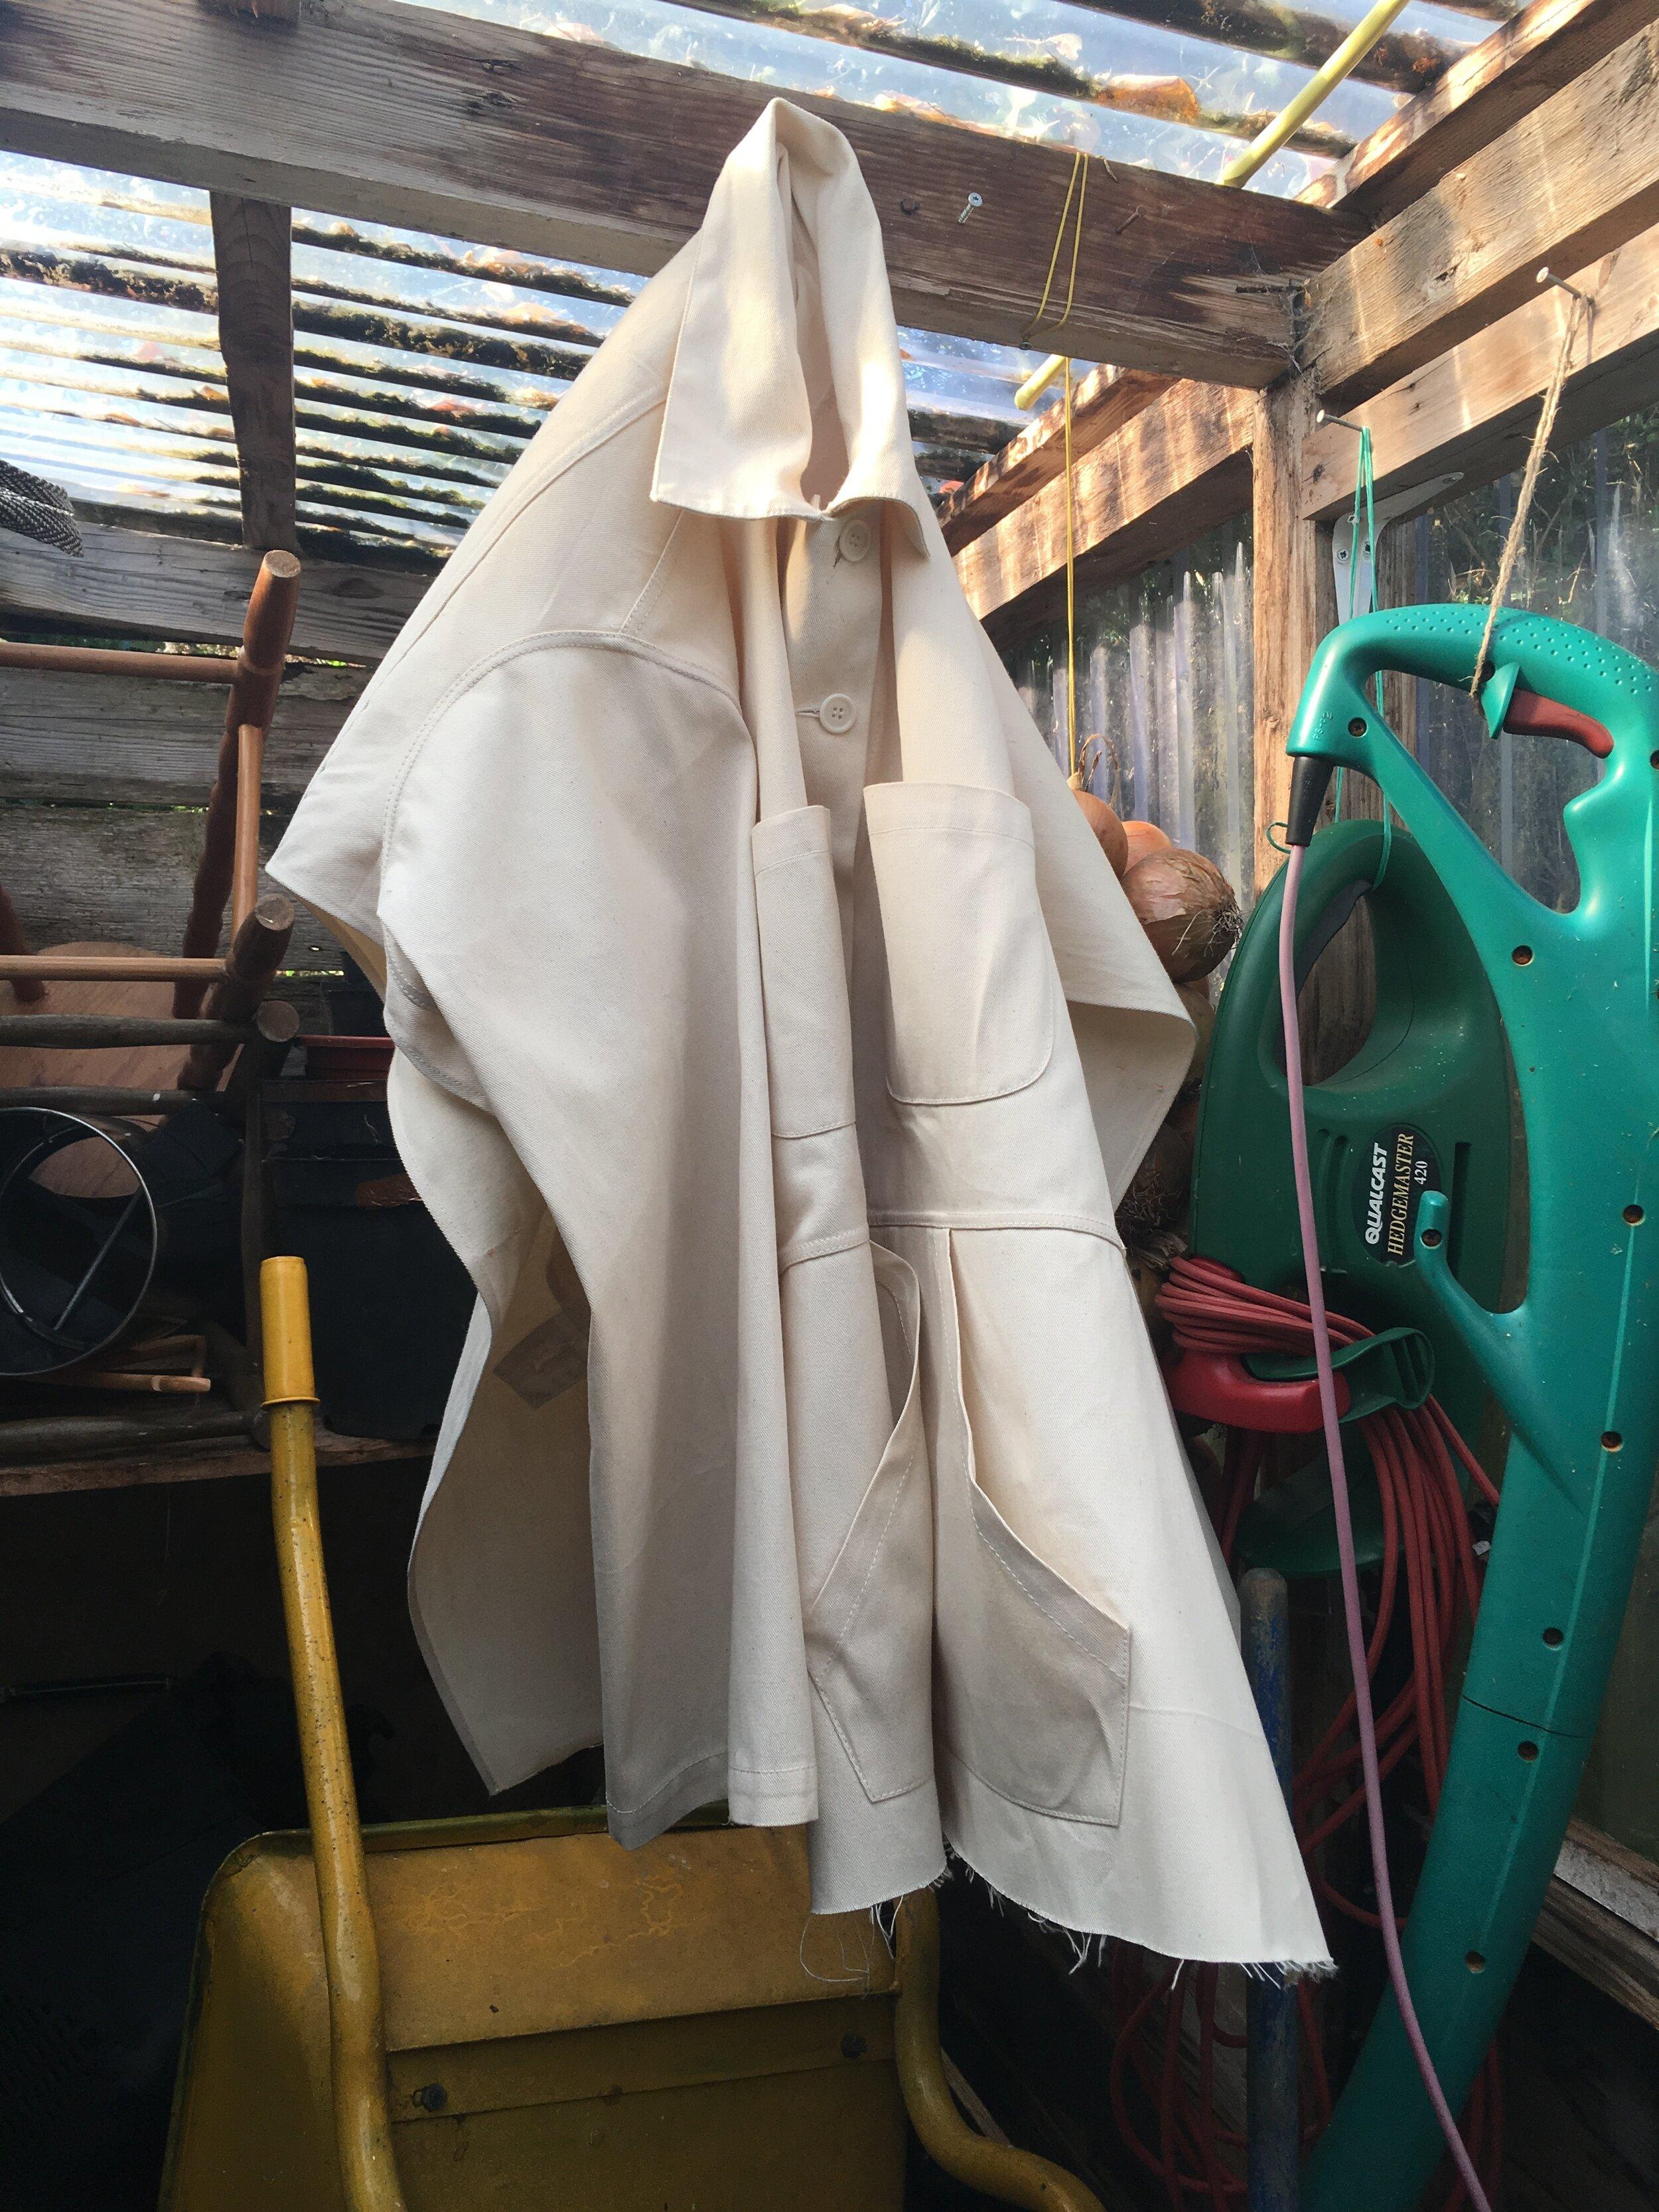 DRESS reconfigured workwear FLAT UTILITY jacket in raw state drill #dressltd #morestories